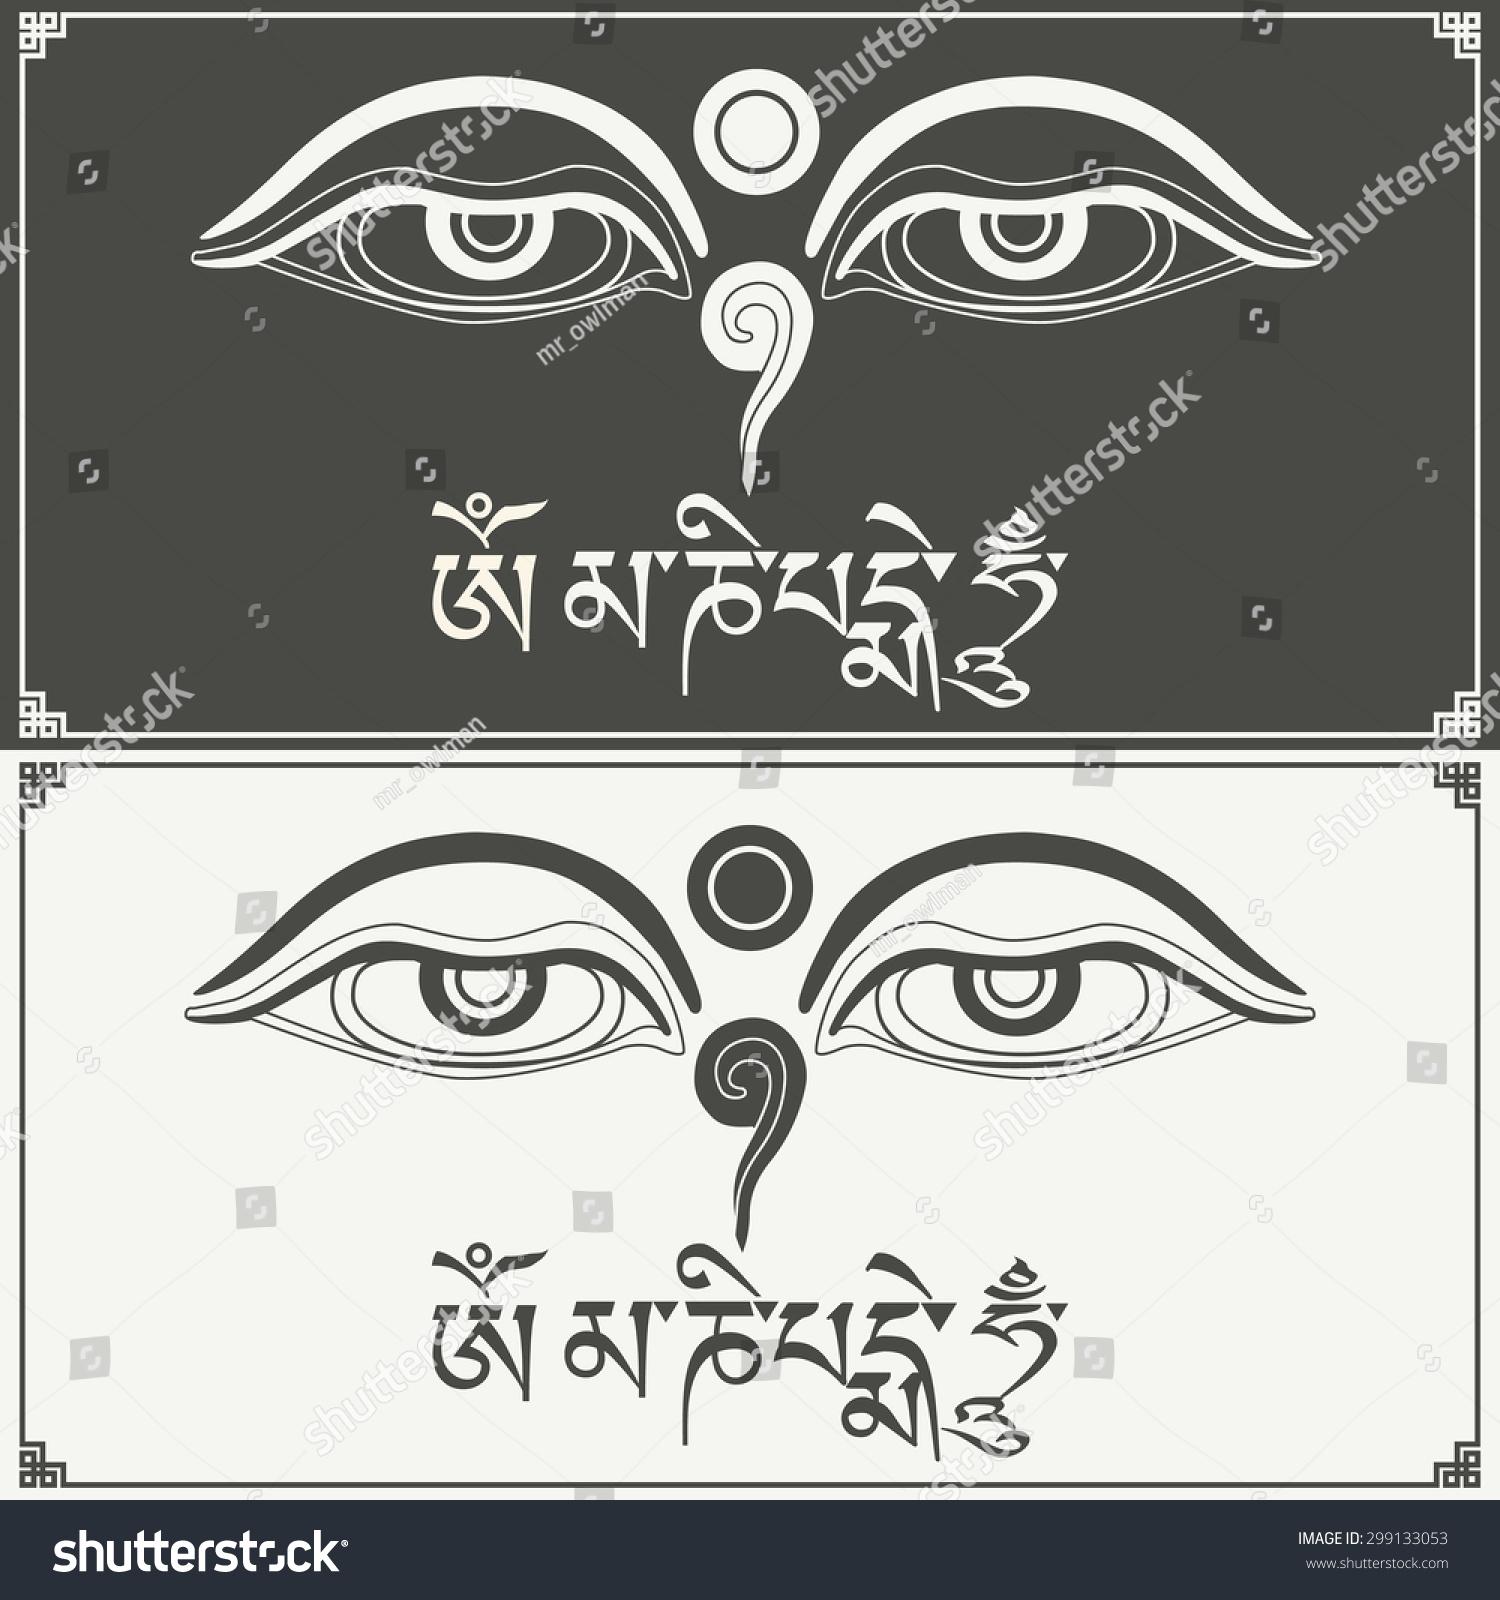 Royalty free eyes of buddha with mantra om mani 299133053 stock eyes of buddha with mantra om mani padme hum buddhas eyes buddhist eyes symbol wisdom and enlightenment nepaltibet stock photo biocorpaavc Images